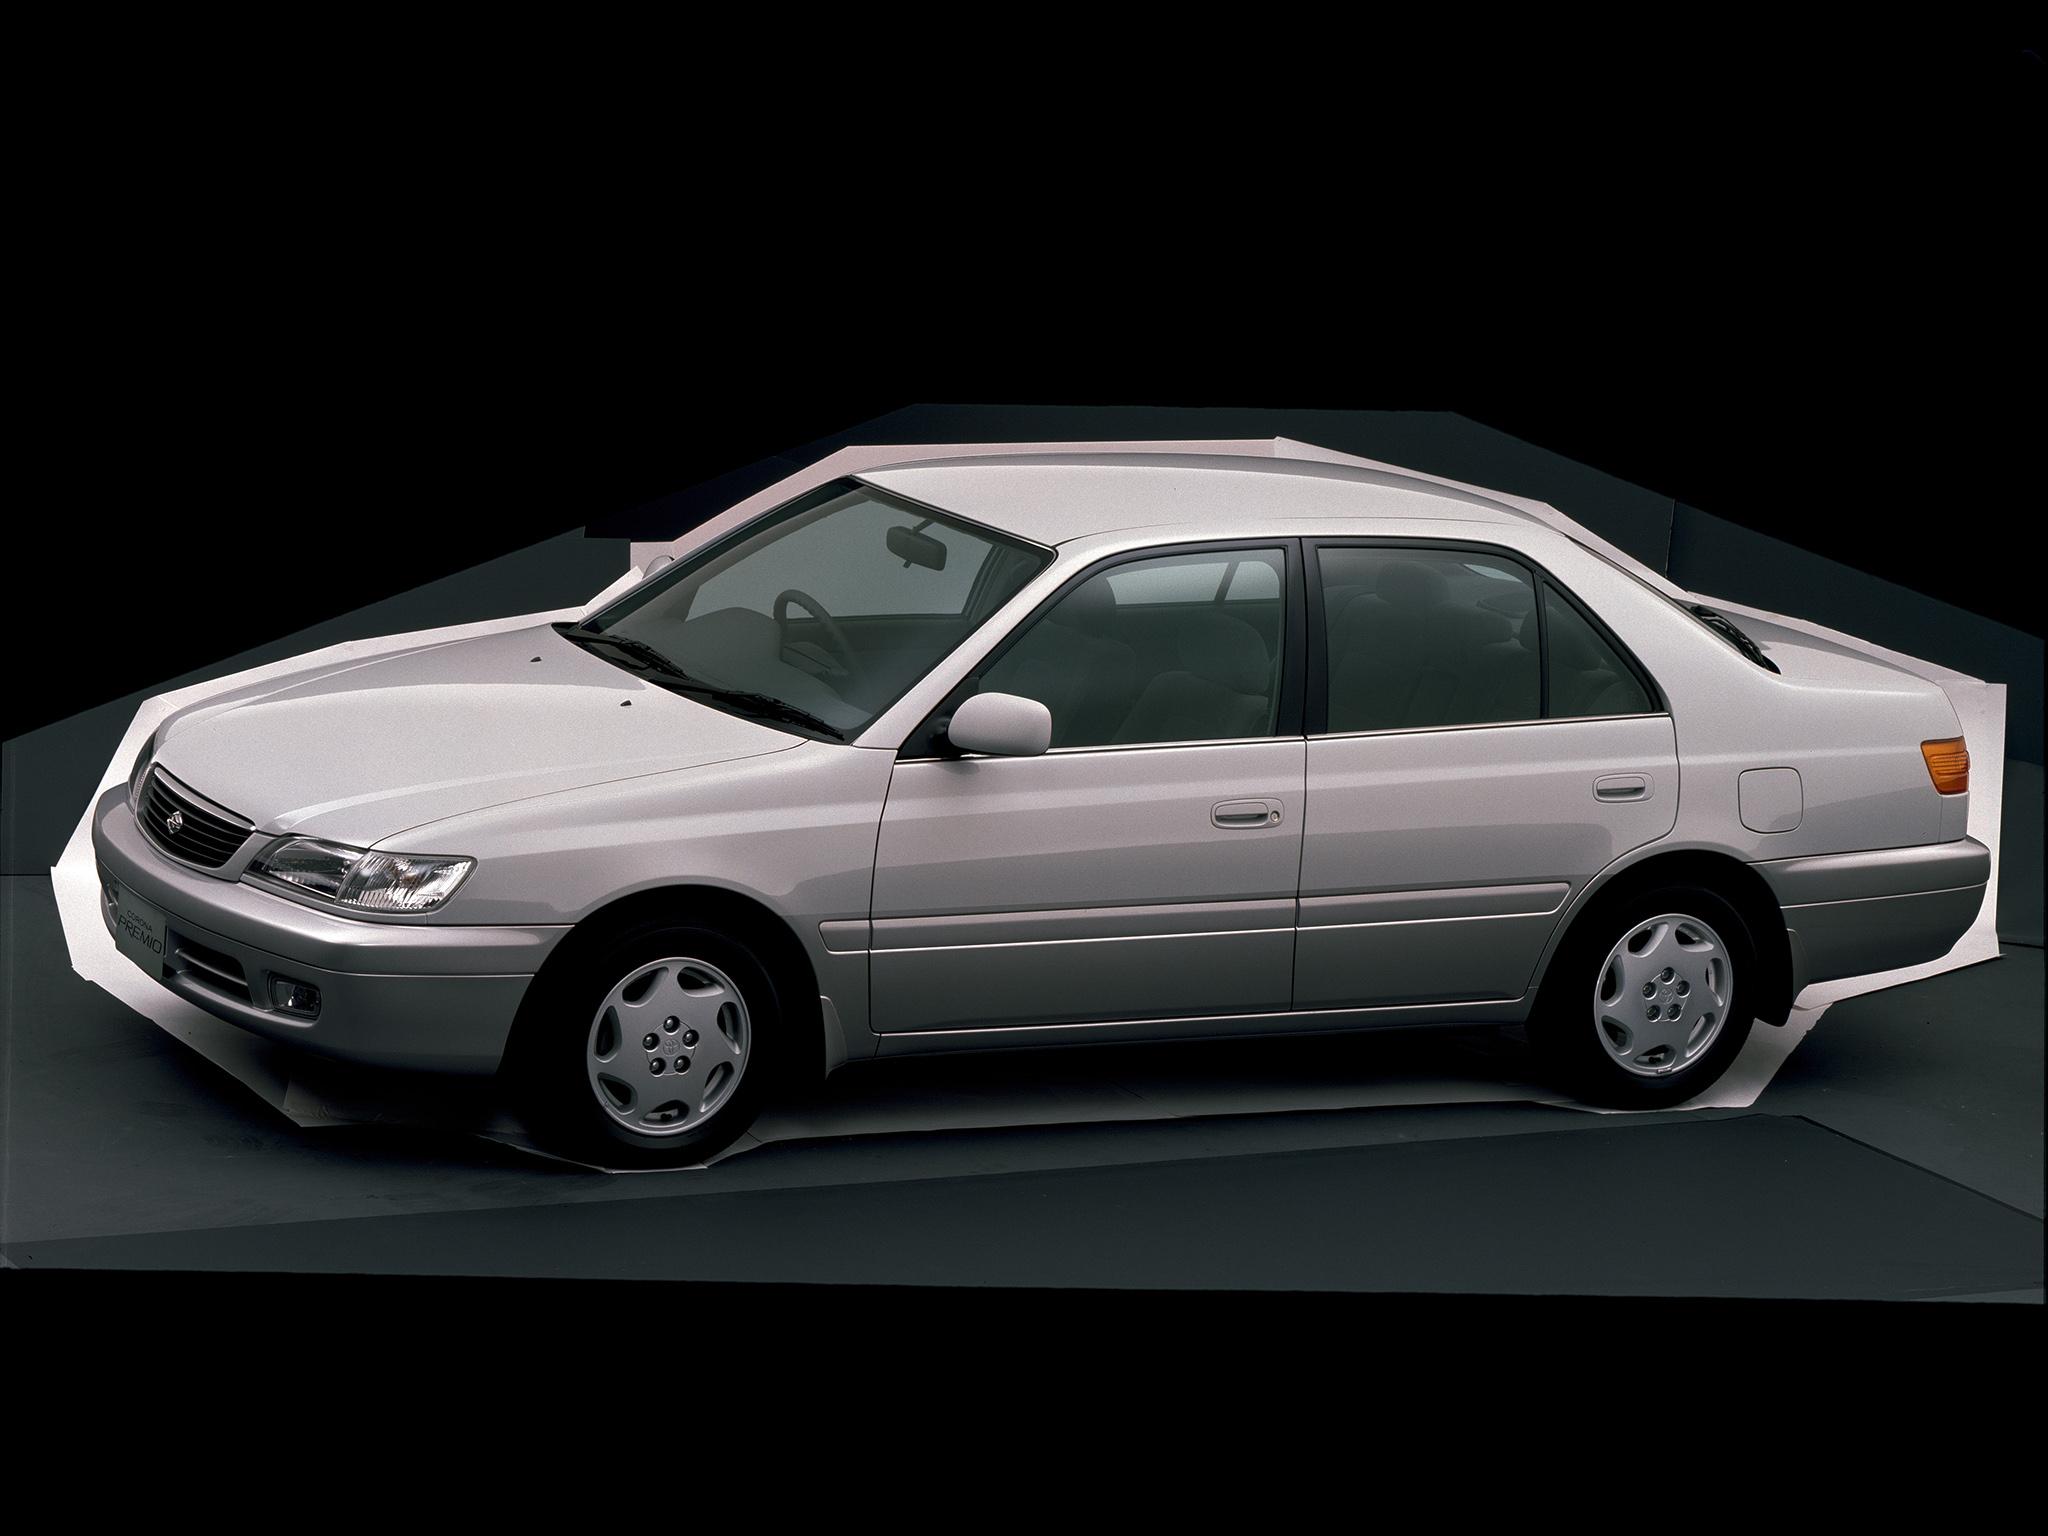 Технические характеристики Toyota Premio / Тойота Премио ...